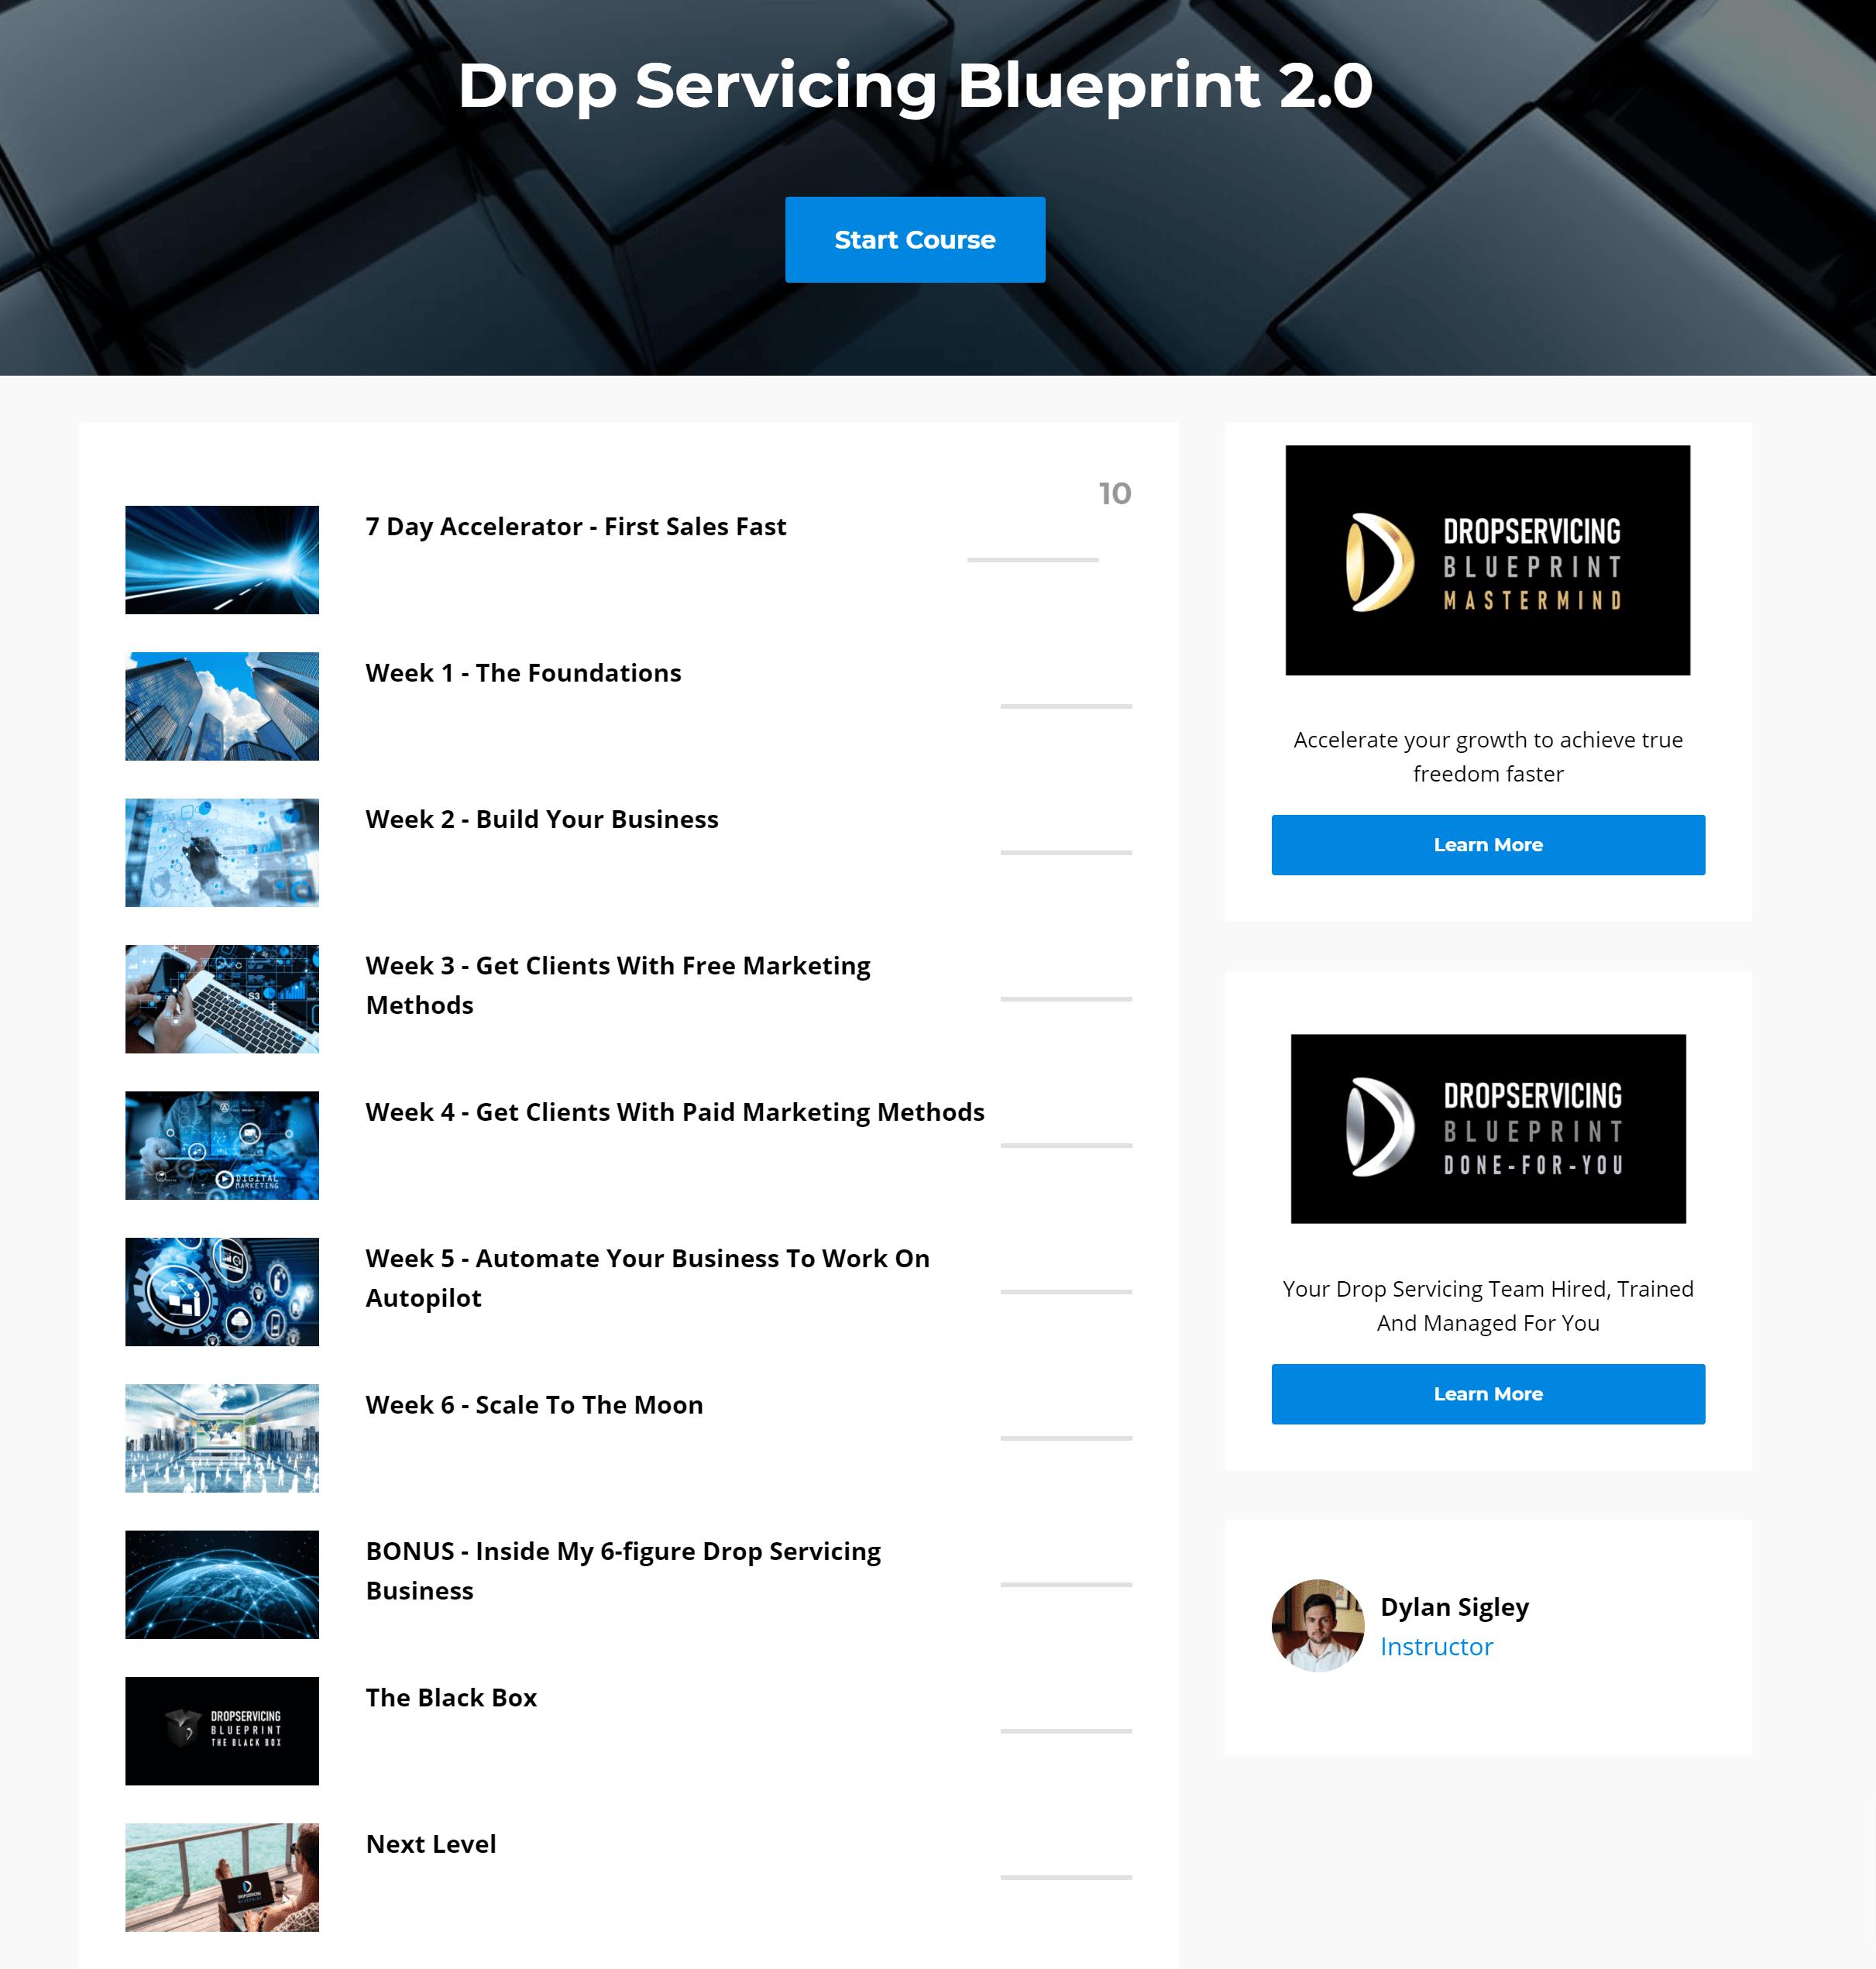 Drop Servicing Blueprint reviews